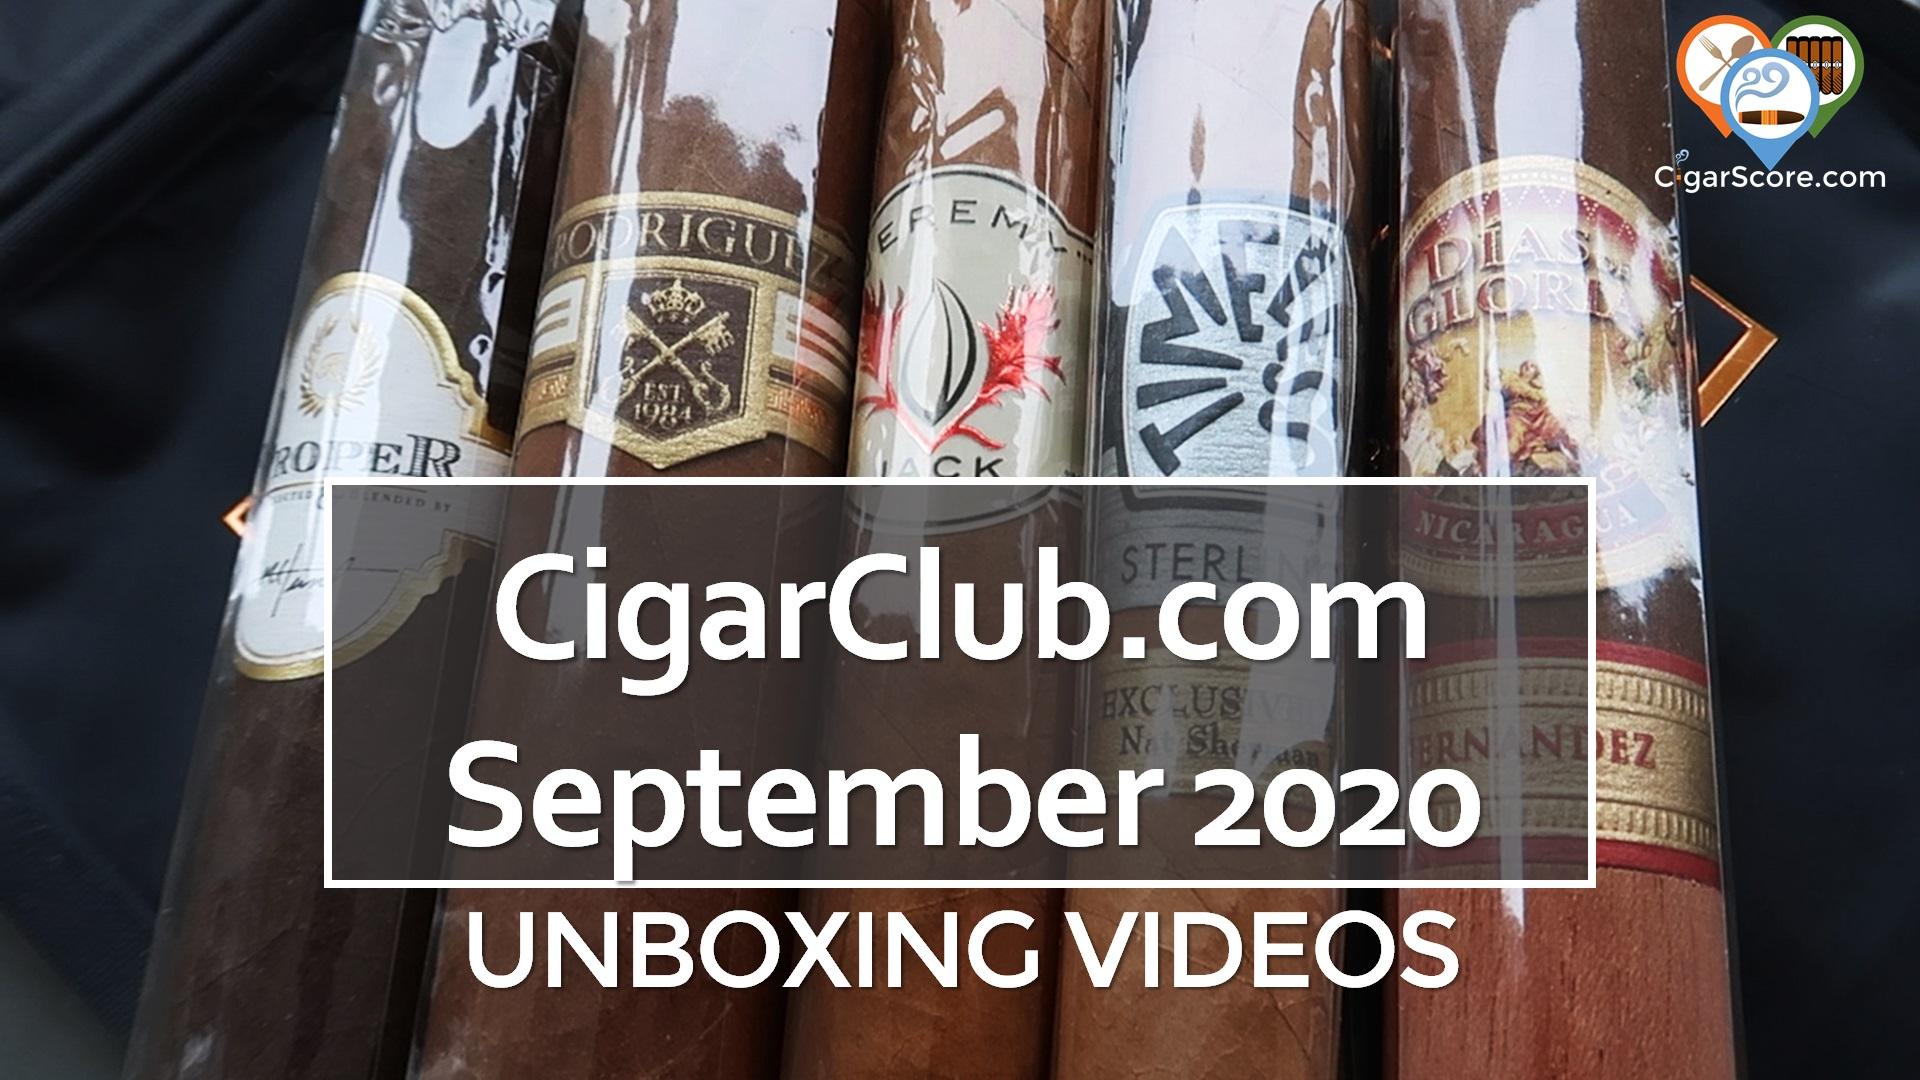 unboxing cigarclub.com september 2020